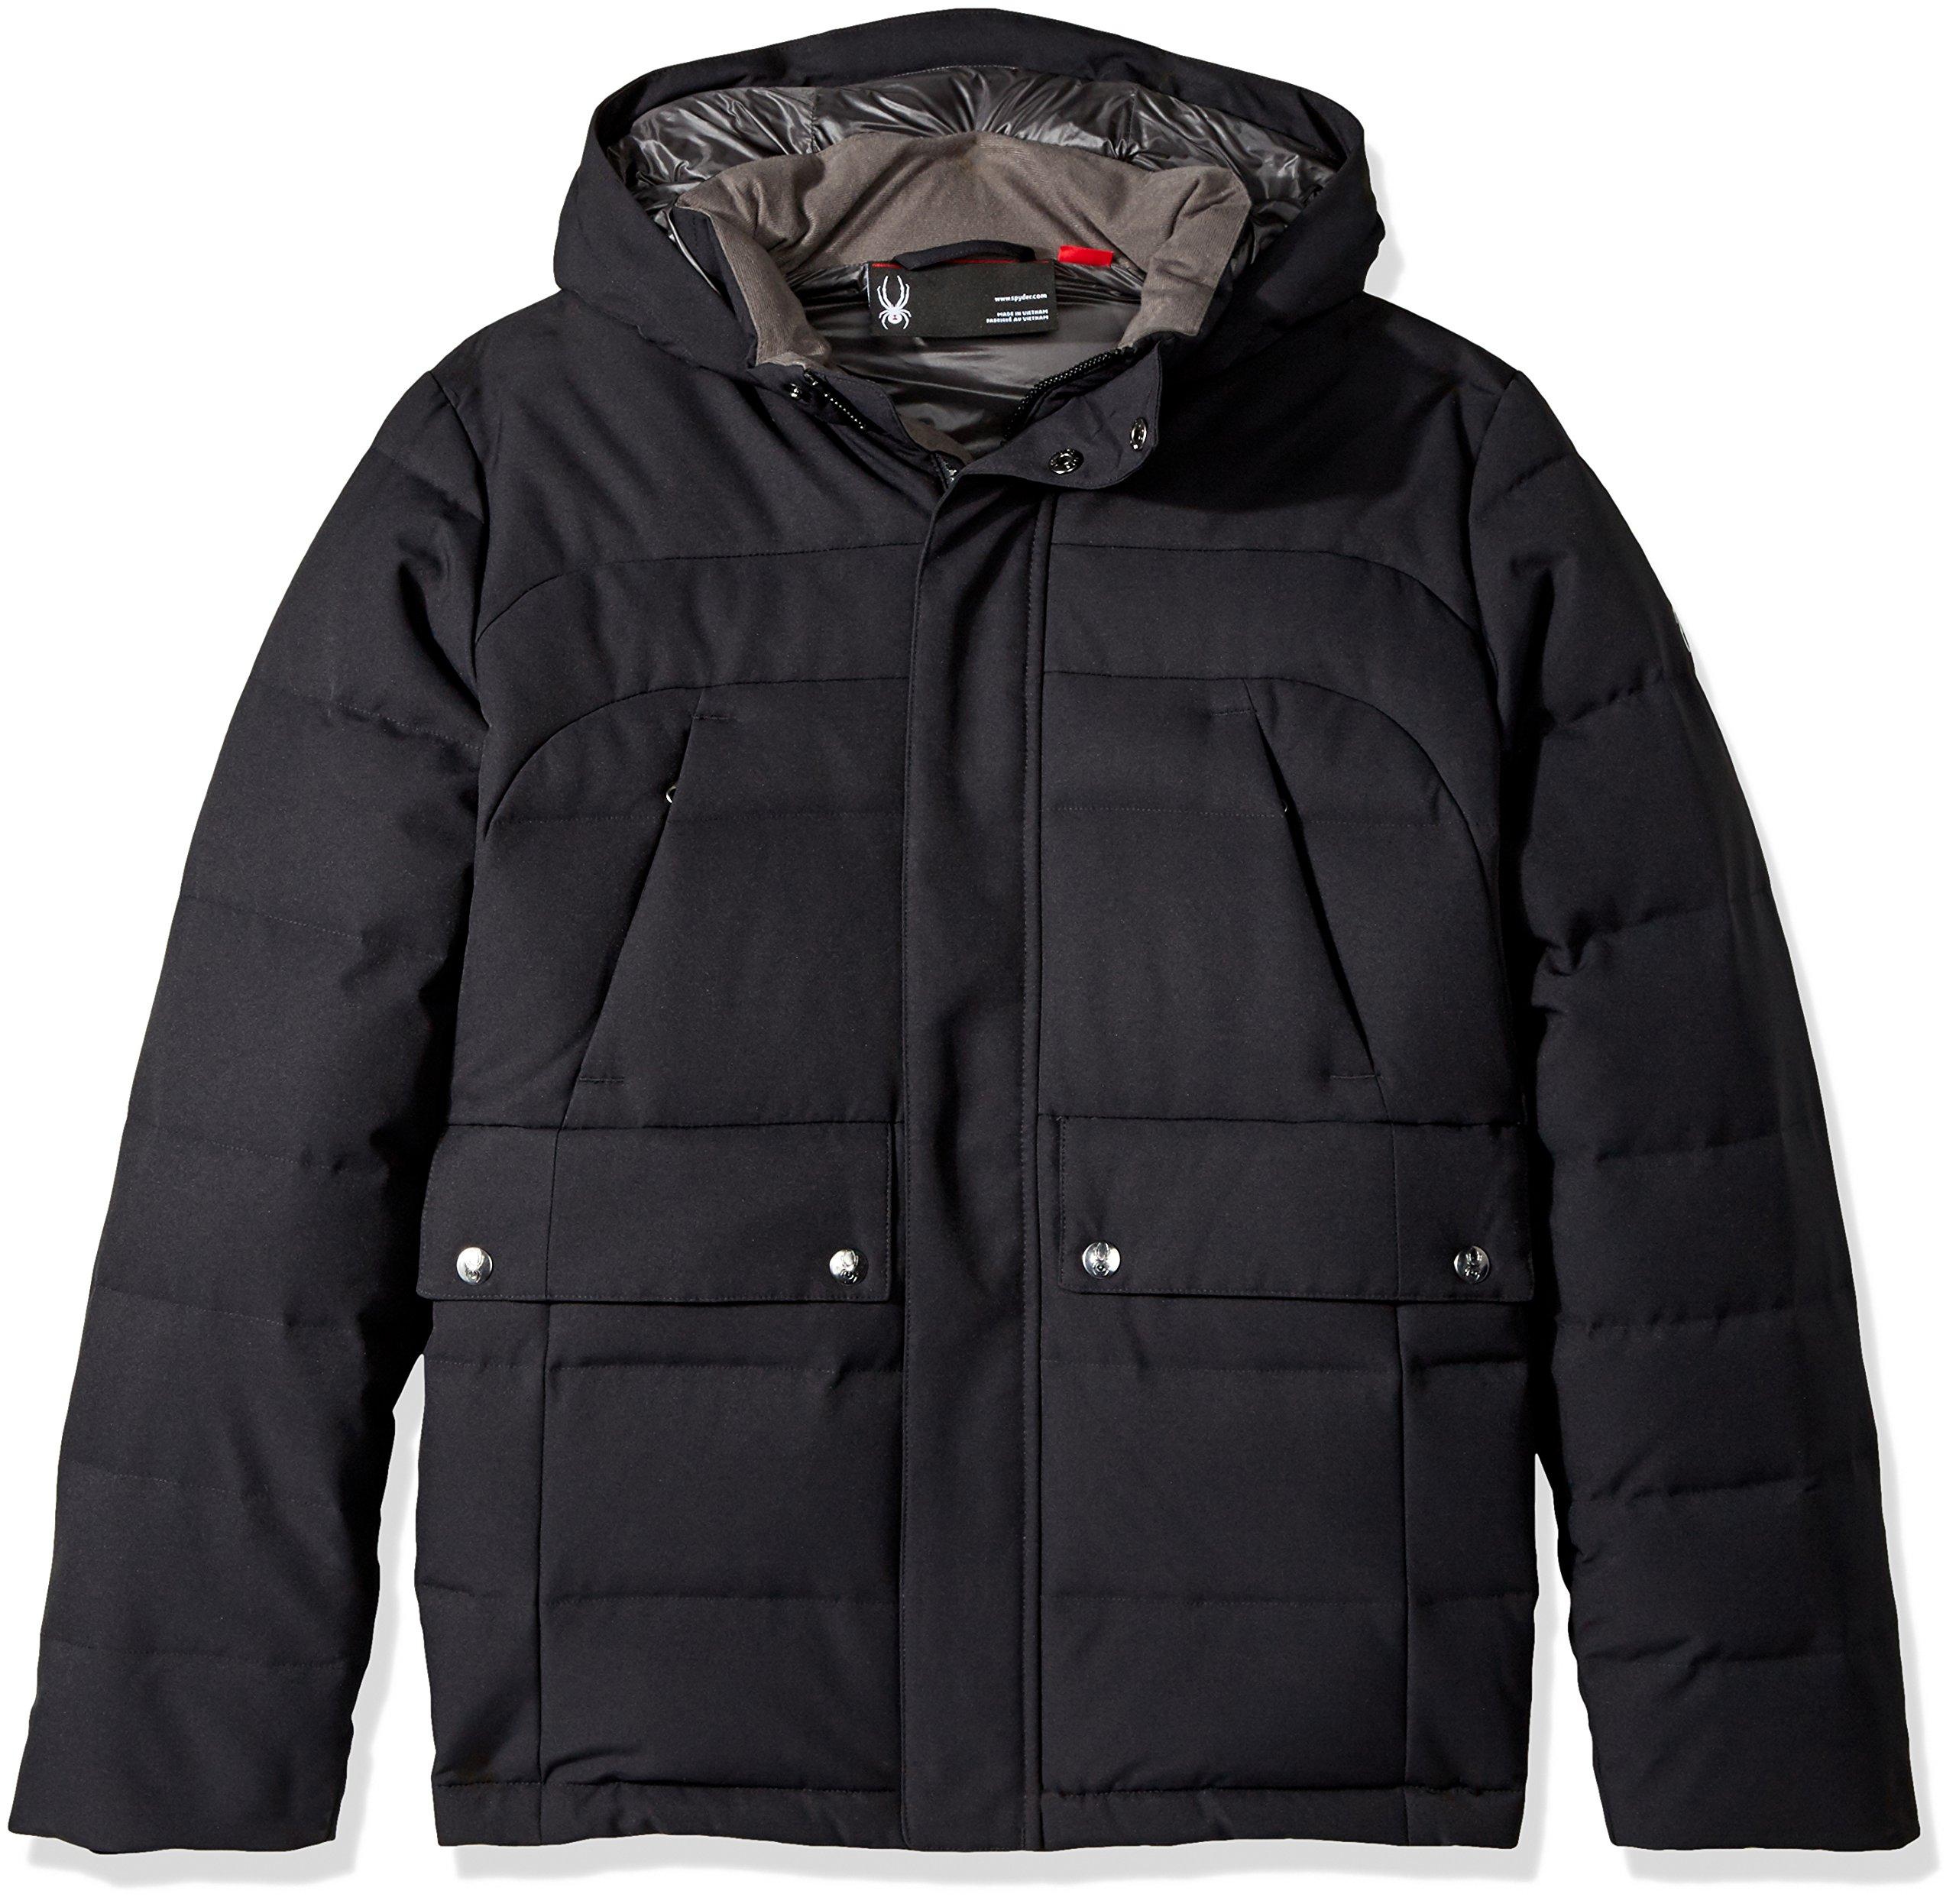 Spyder Boy's Garrison Jacket, Black/Black, Small